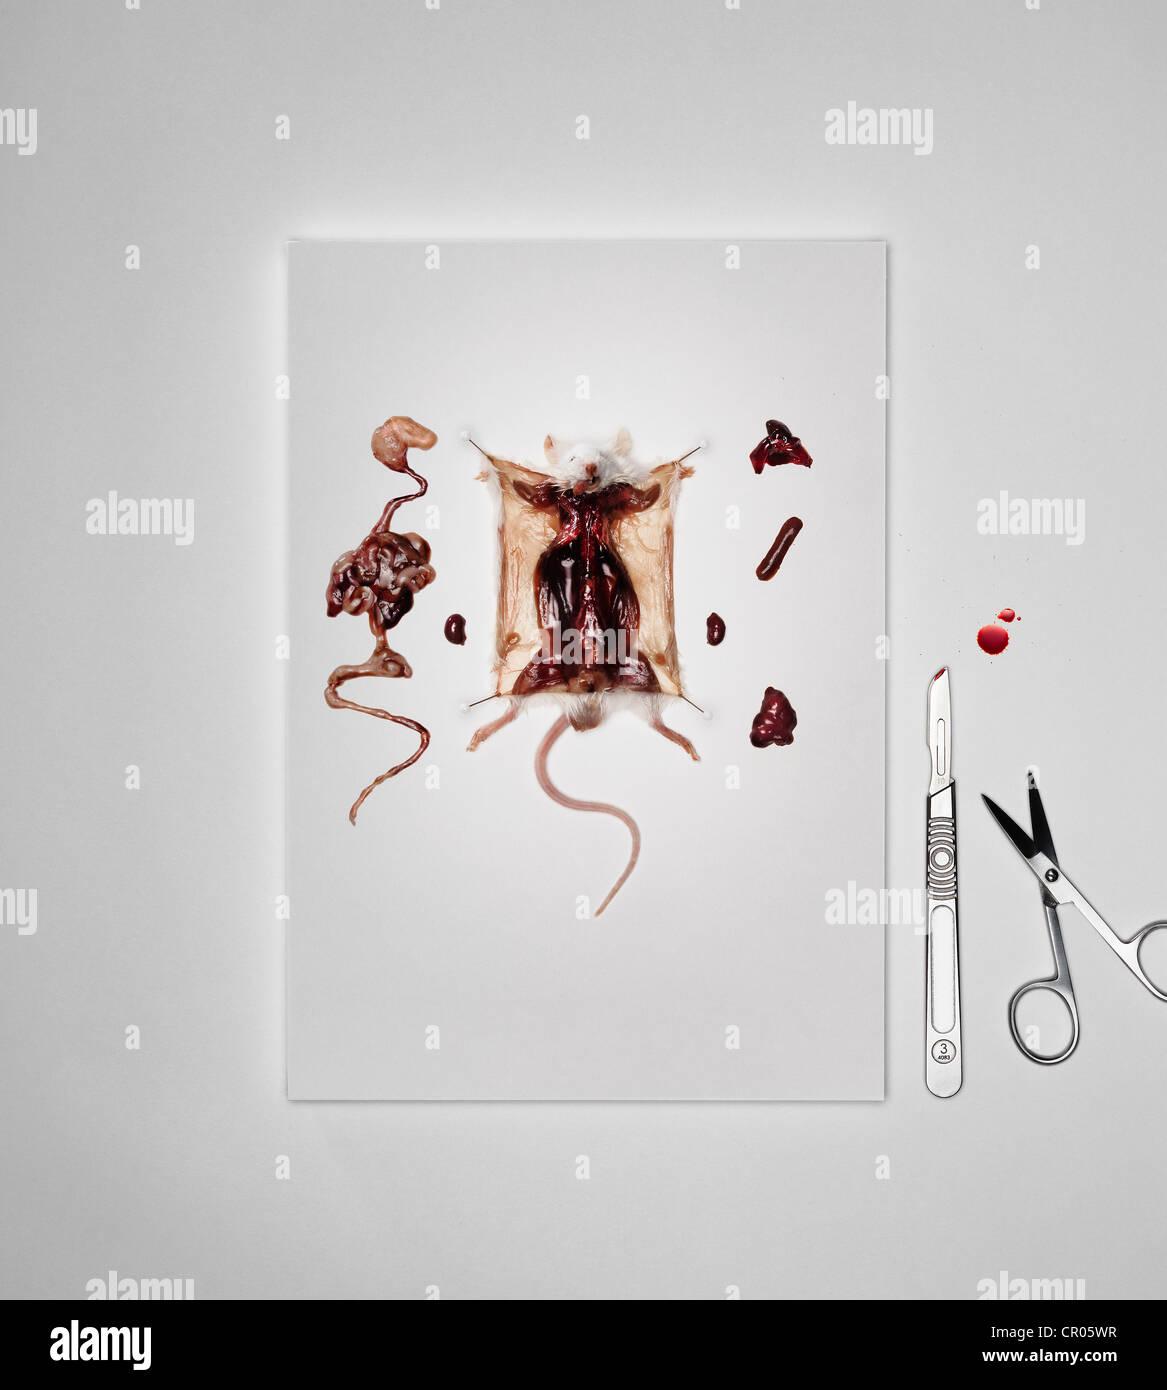 Dissecting Imágenes De Stock & Dissecting Fotos De Stock - Alamy